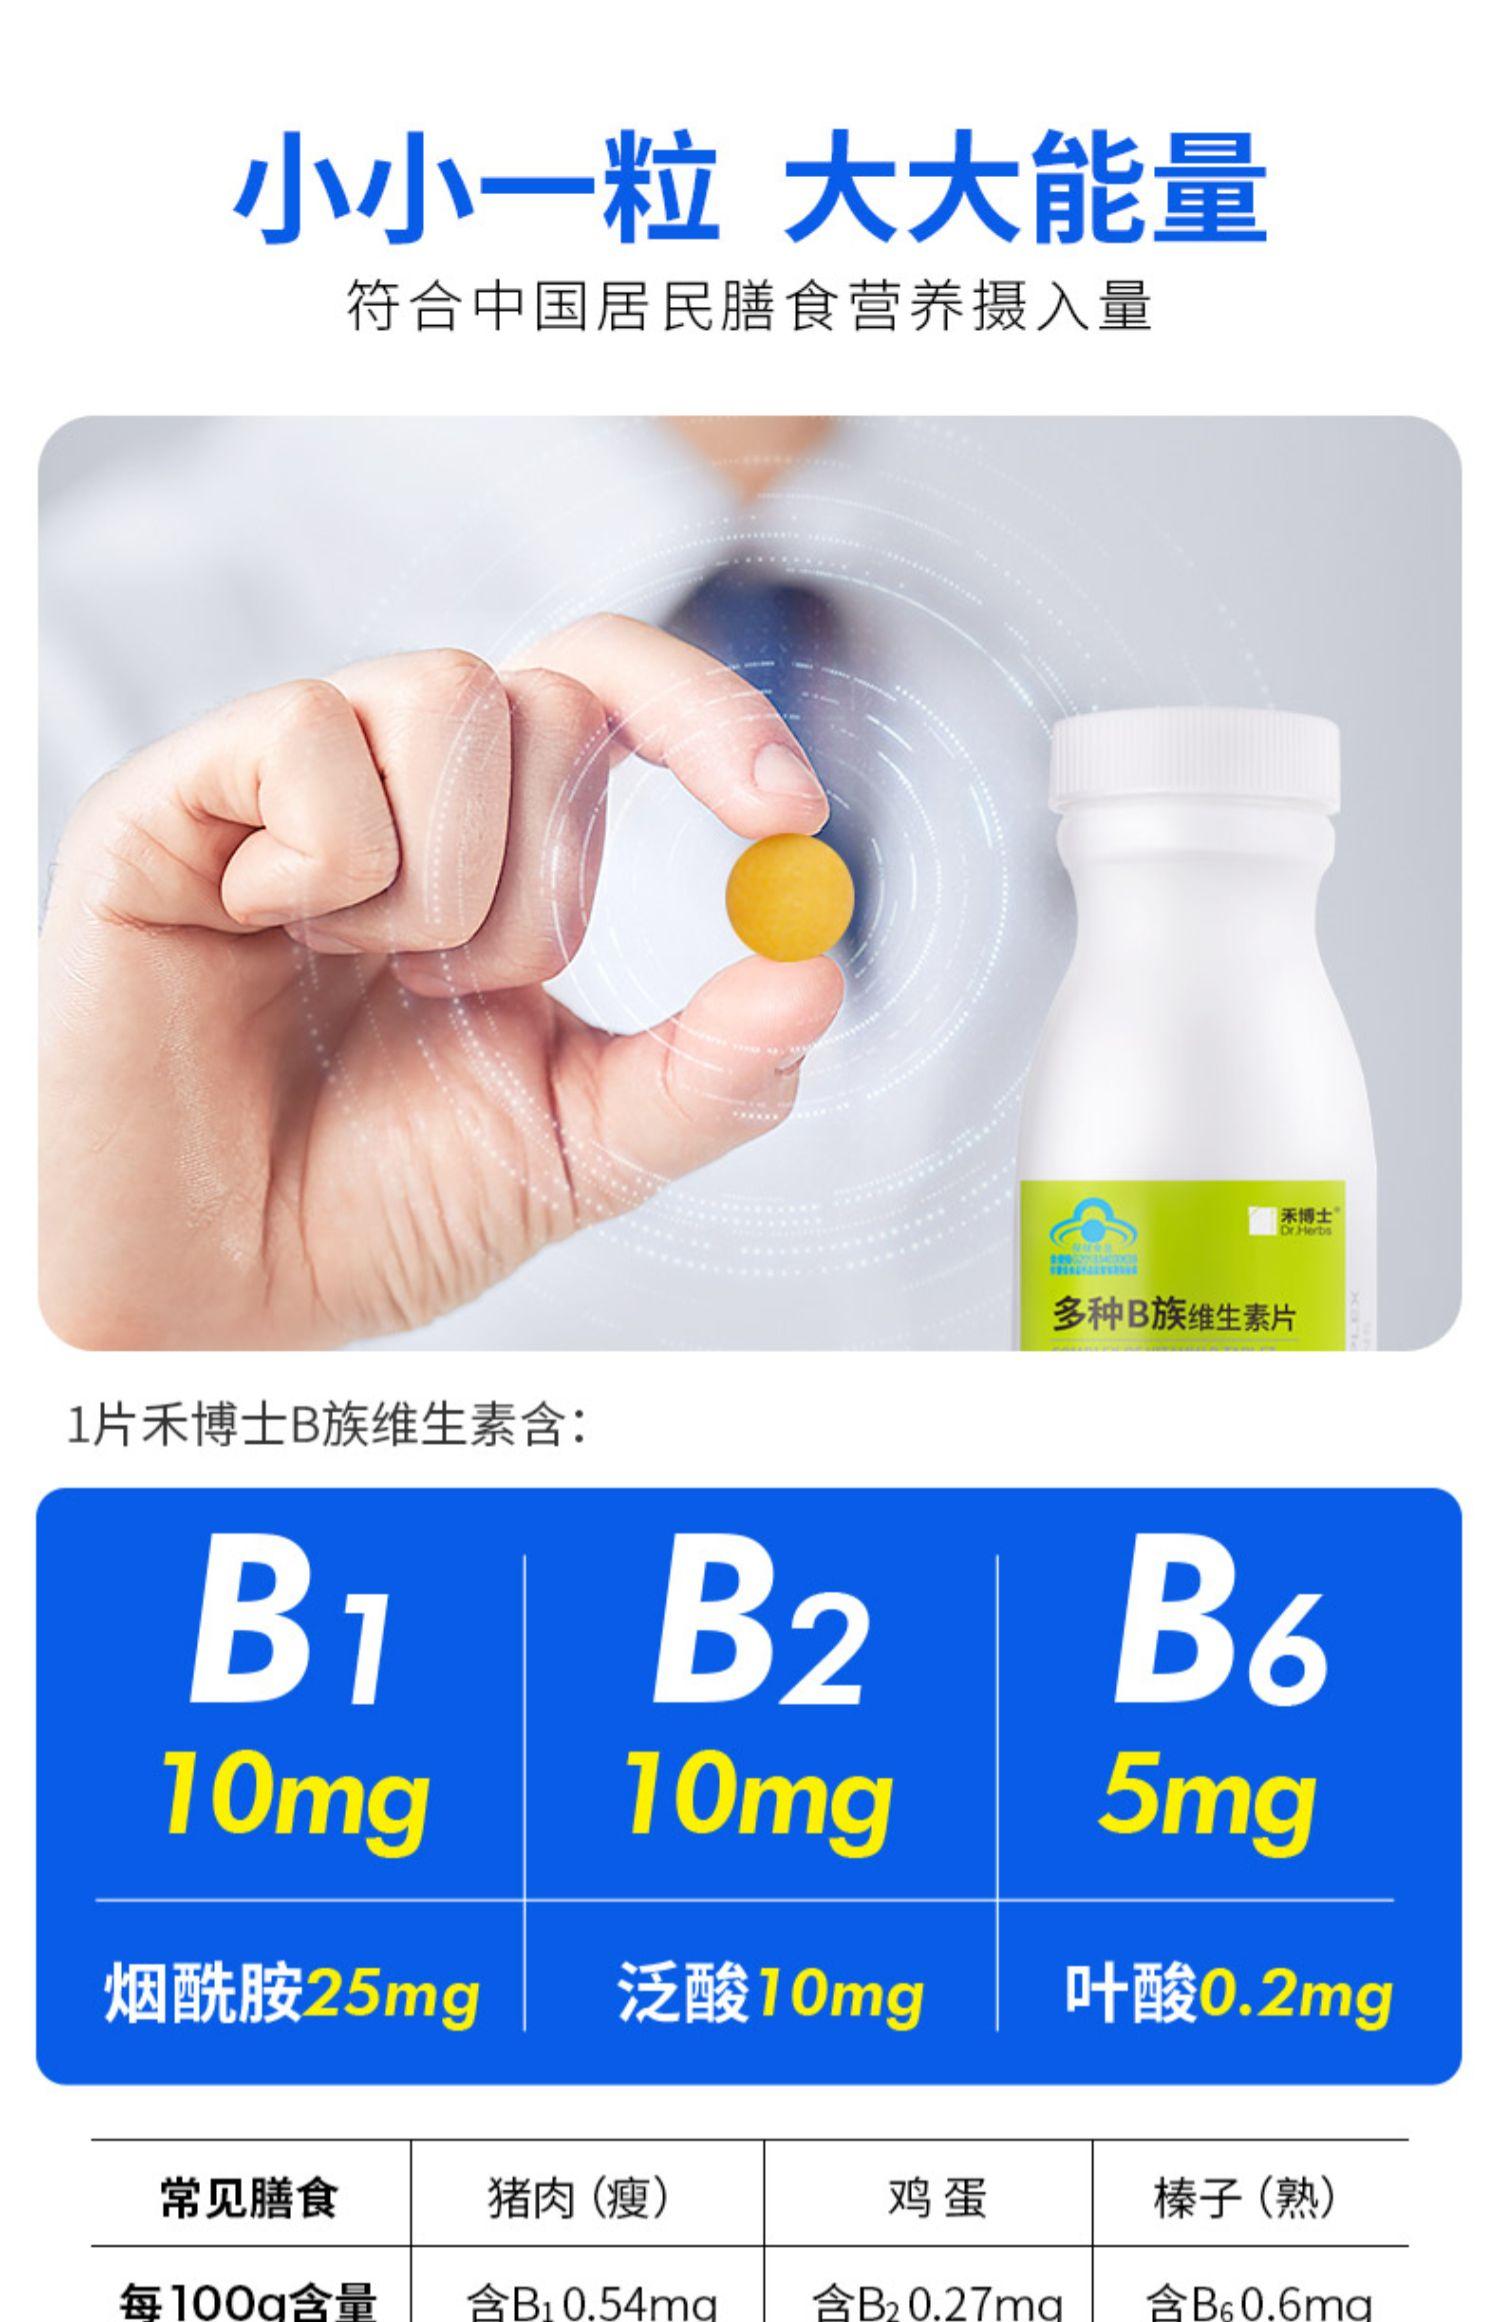 B族维生素真的能降肝火吗?完整的答案在这里